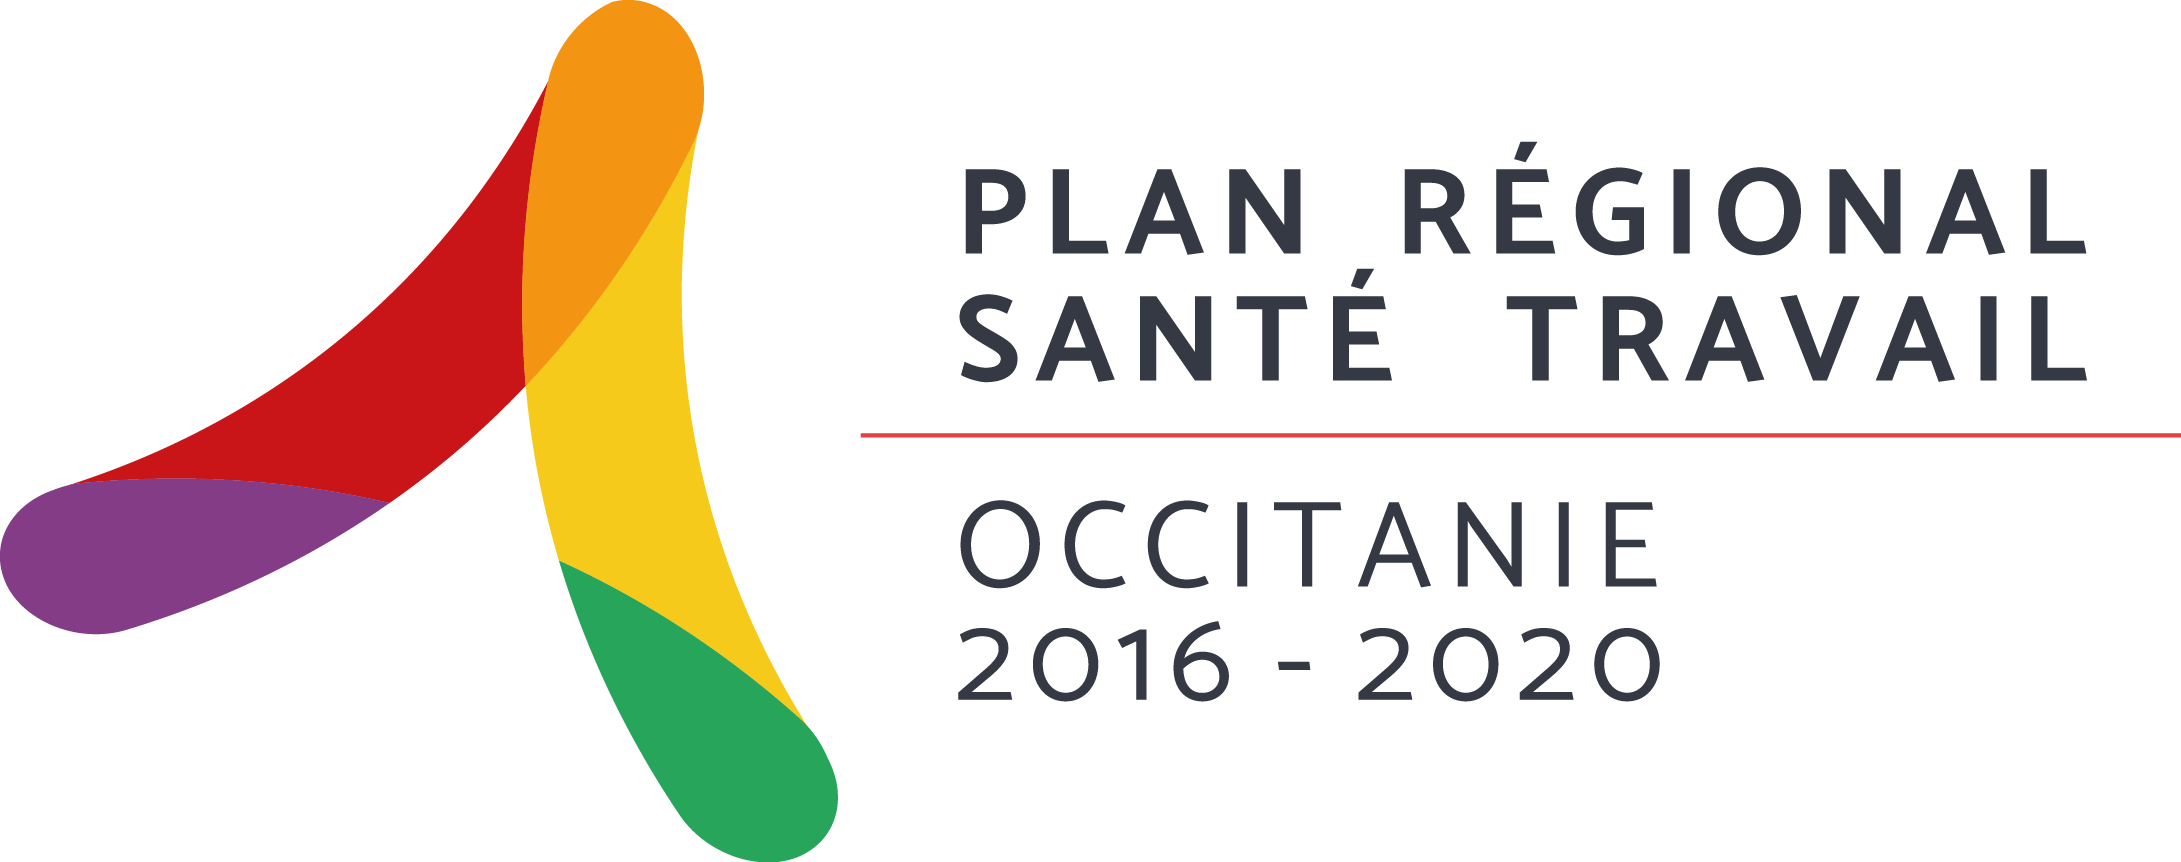 https://occitanie.aract.fr/sites/default/files/2019-11/PRST3_OCCITANIE_LOGOV2.png